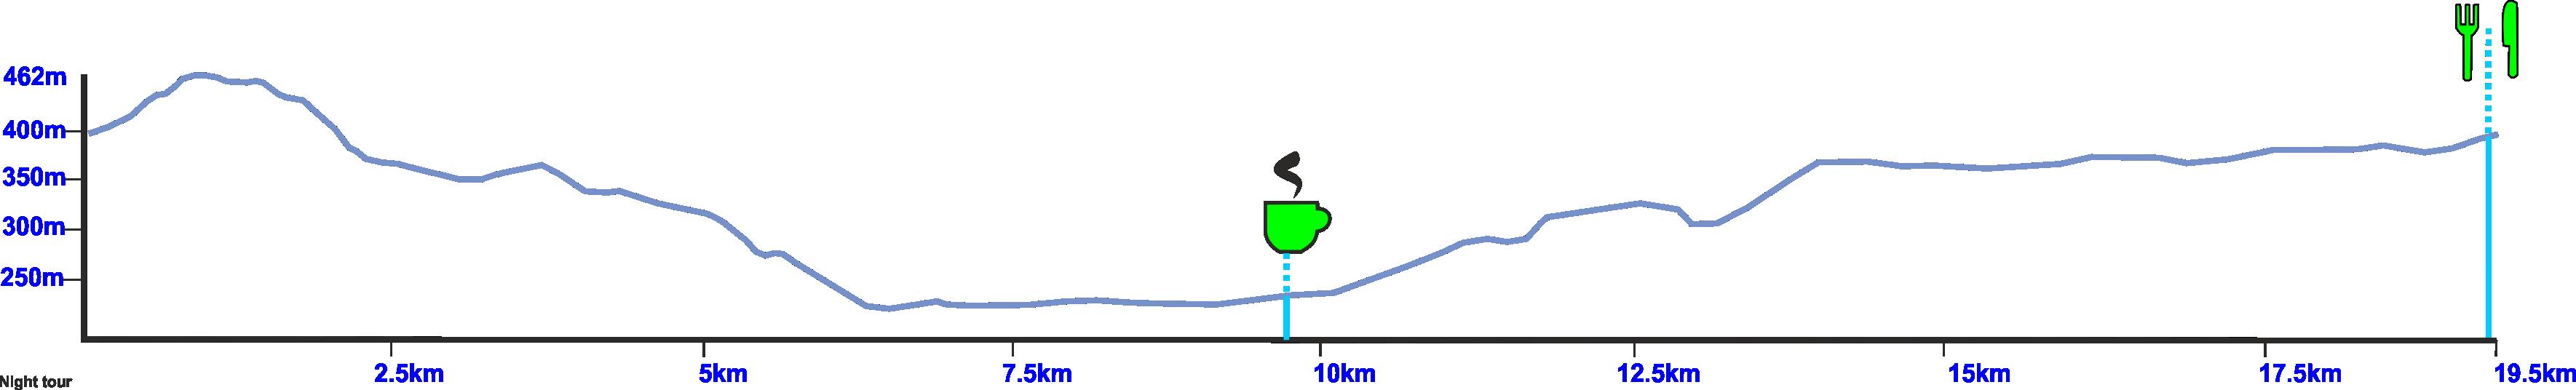 night bike tour elevation profile